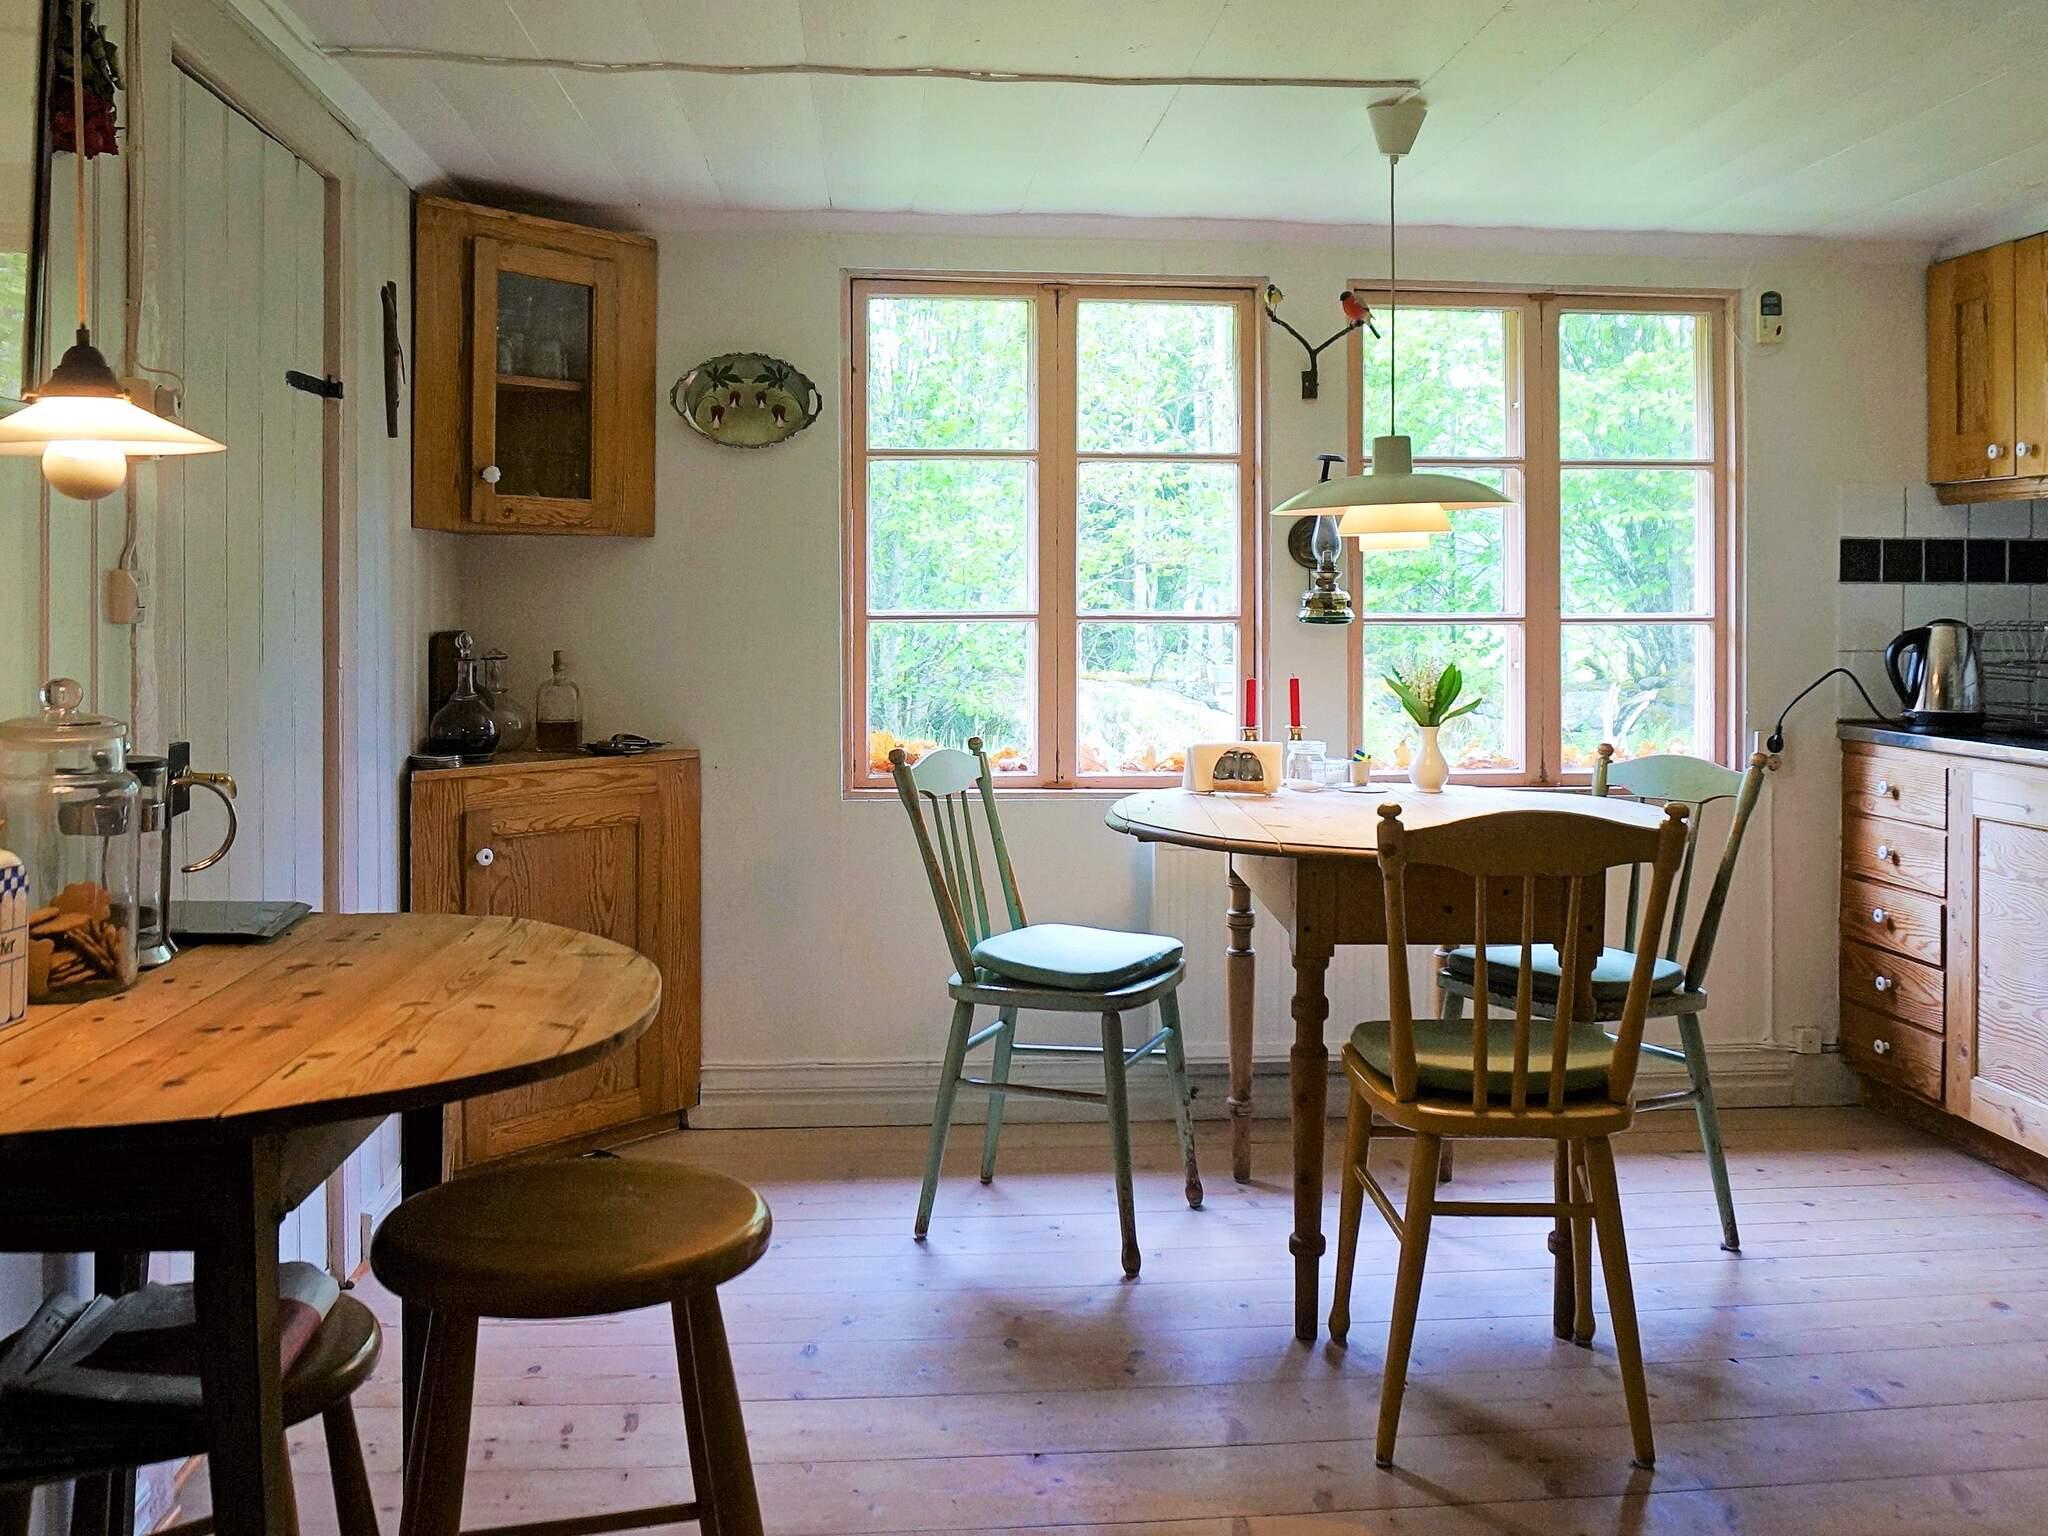 Ferienhaus Falköping (2636837), Trädet, Västra Götaland län, Westschweden, Schweden, Bild 5